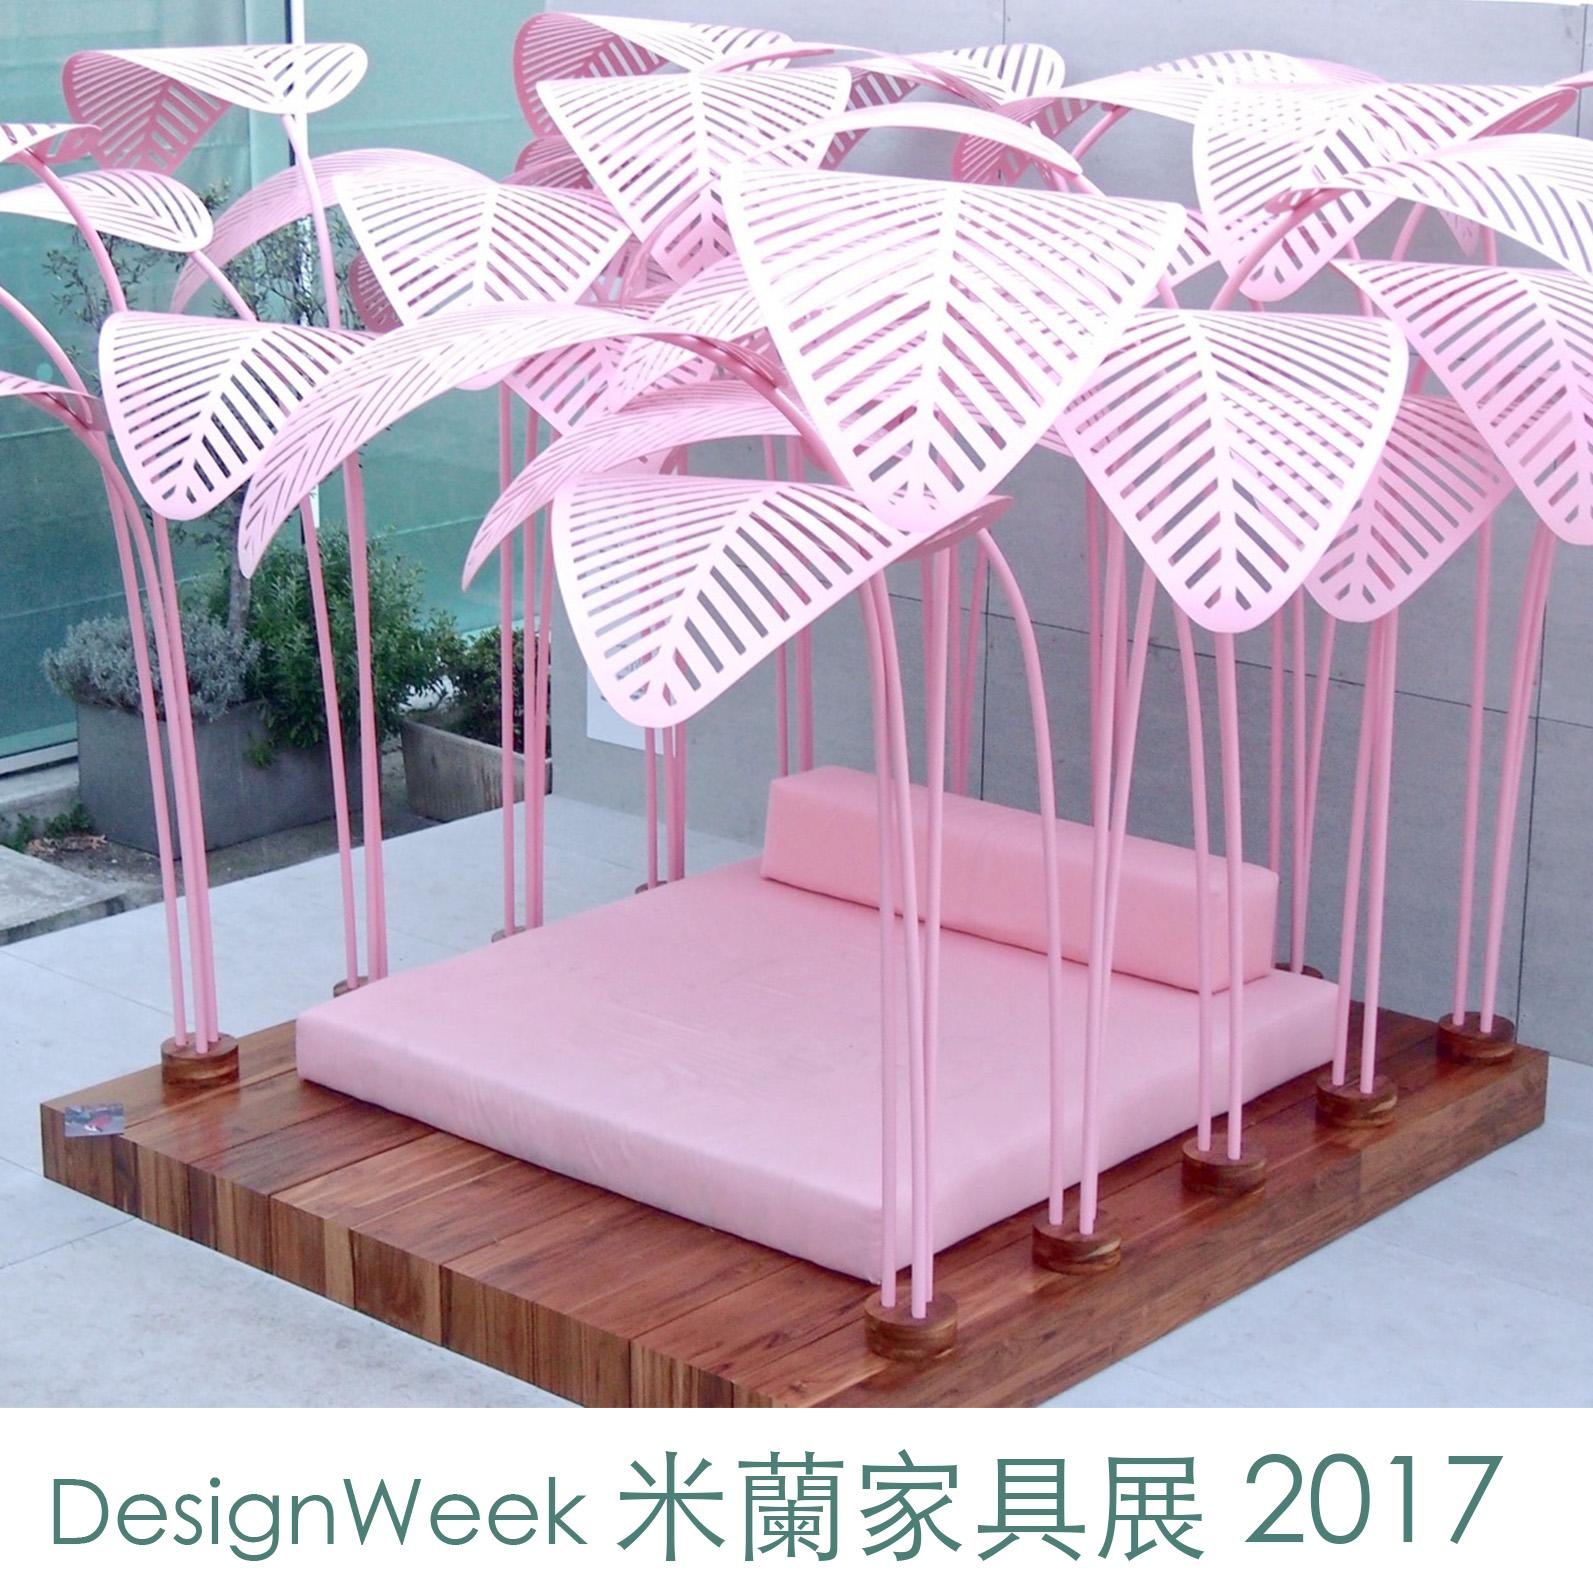 designweeksquare.jpg